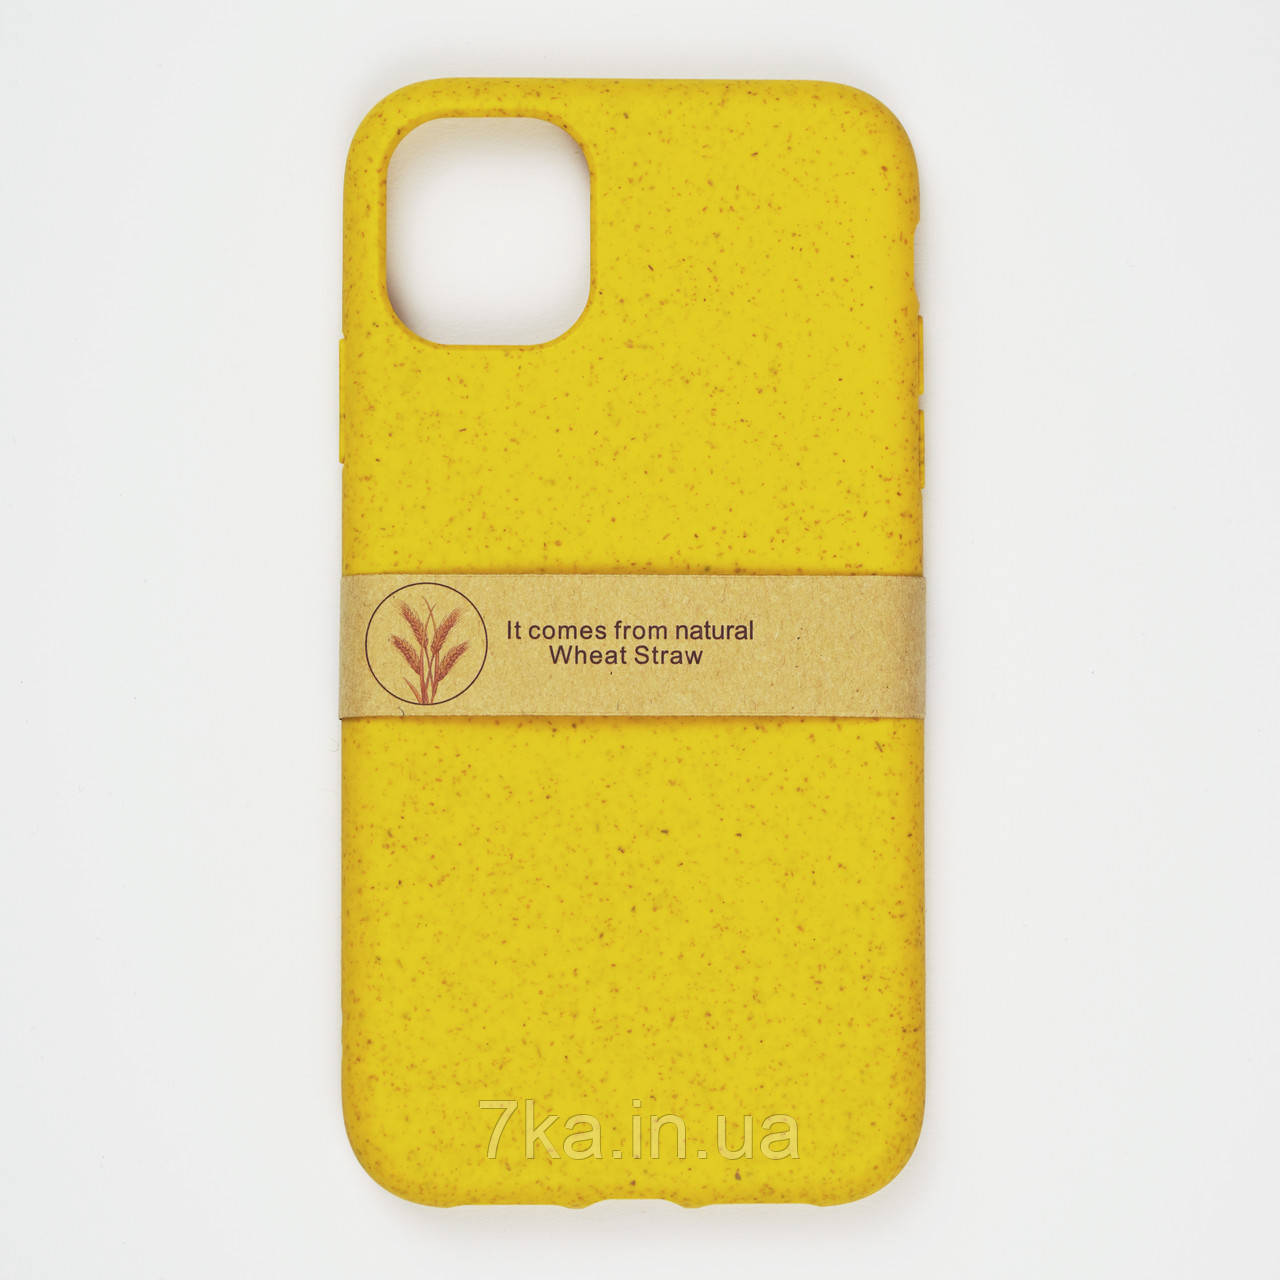 Биоразлагаемый чехол ECO Wheat Straw для iPhone 11 Yellow